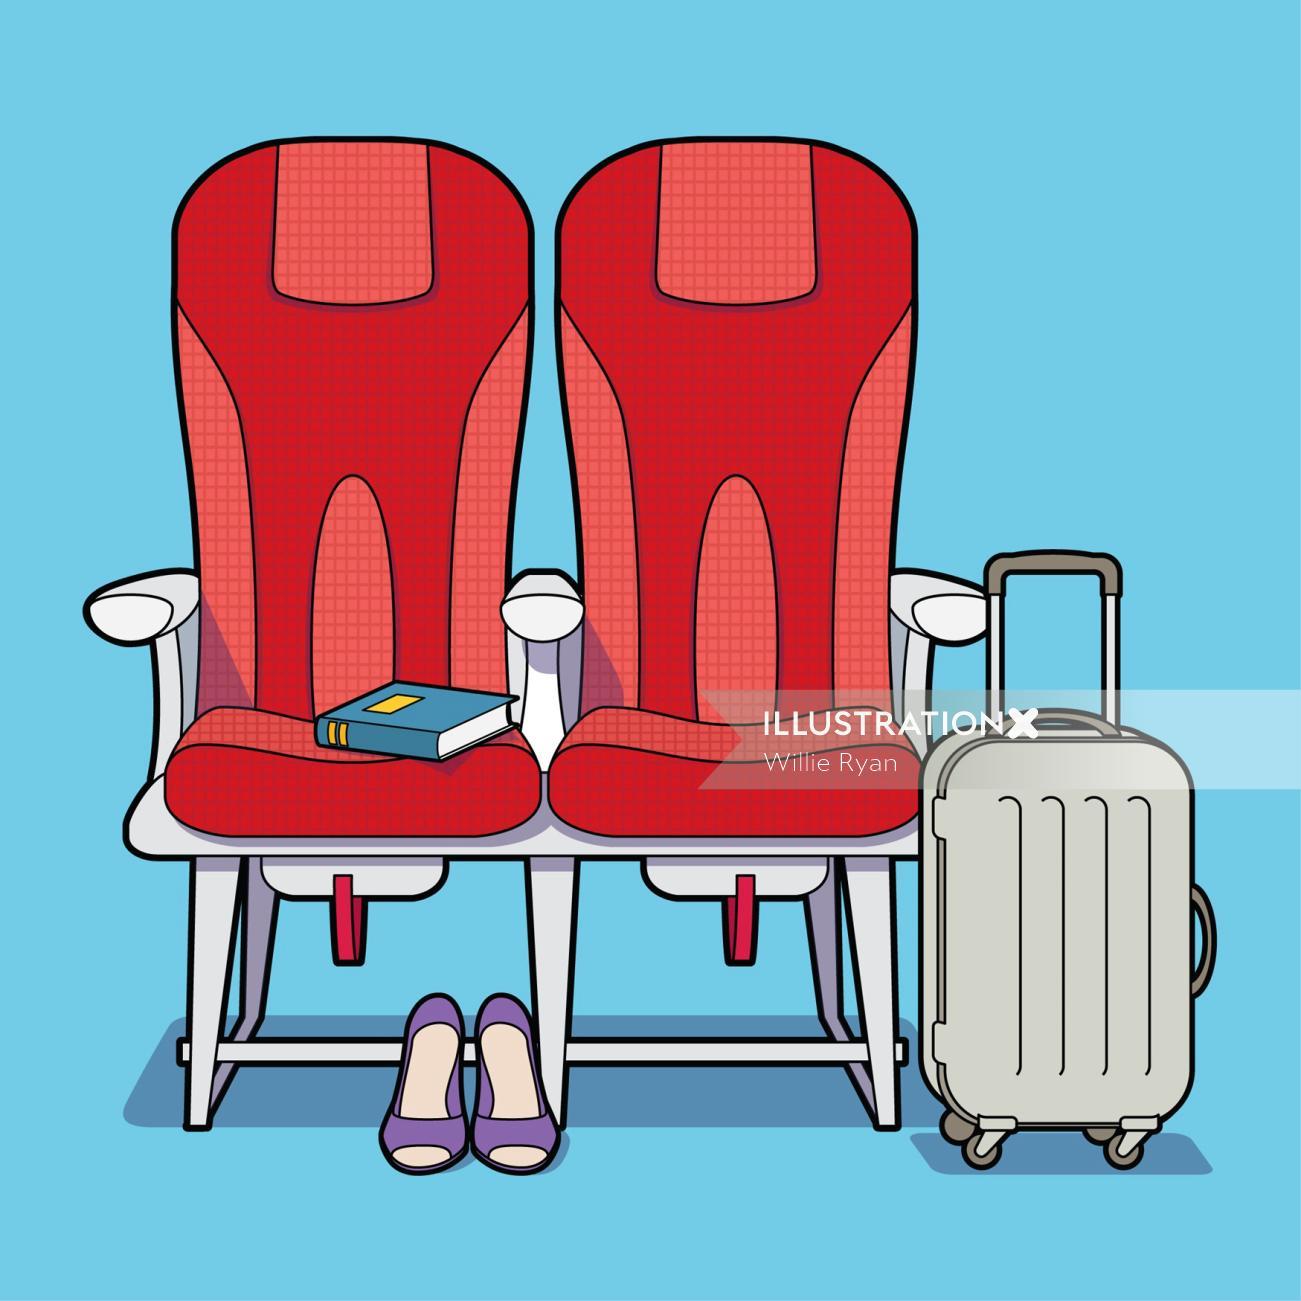 Graphic Illustration For Listerine Breath aeroplane seating,Willie,Ryan,illustrator,illustration,gra